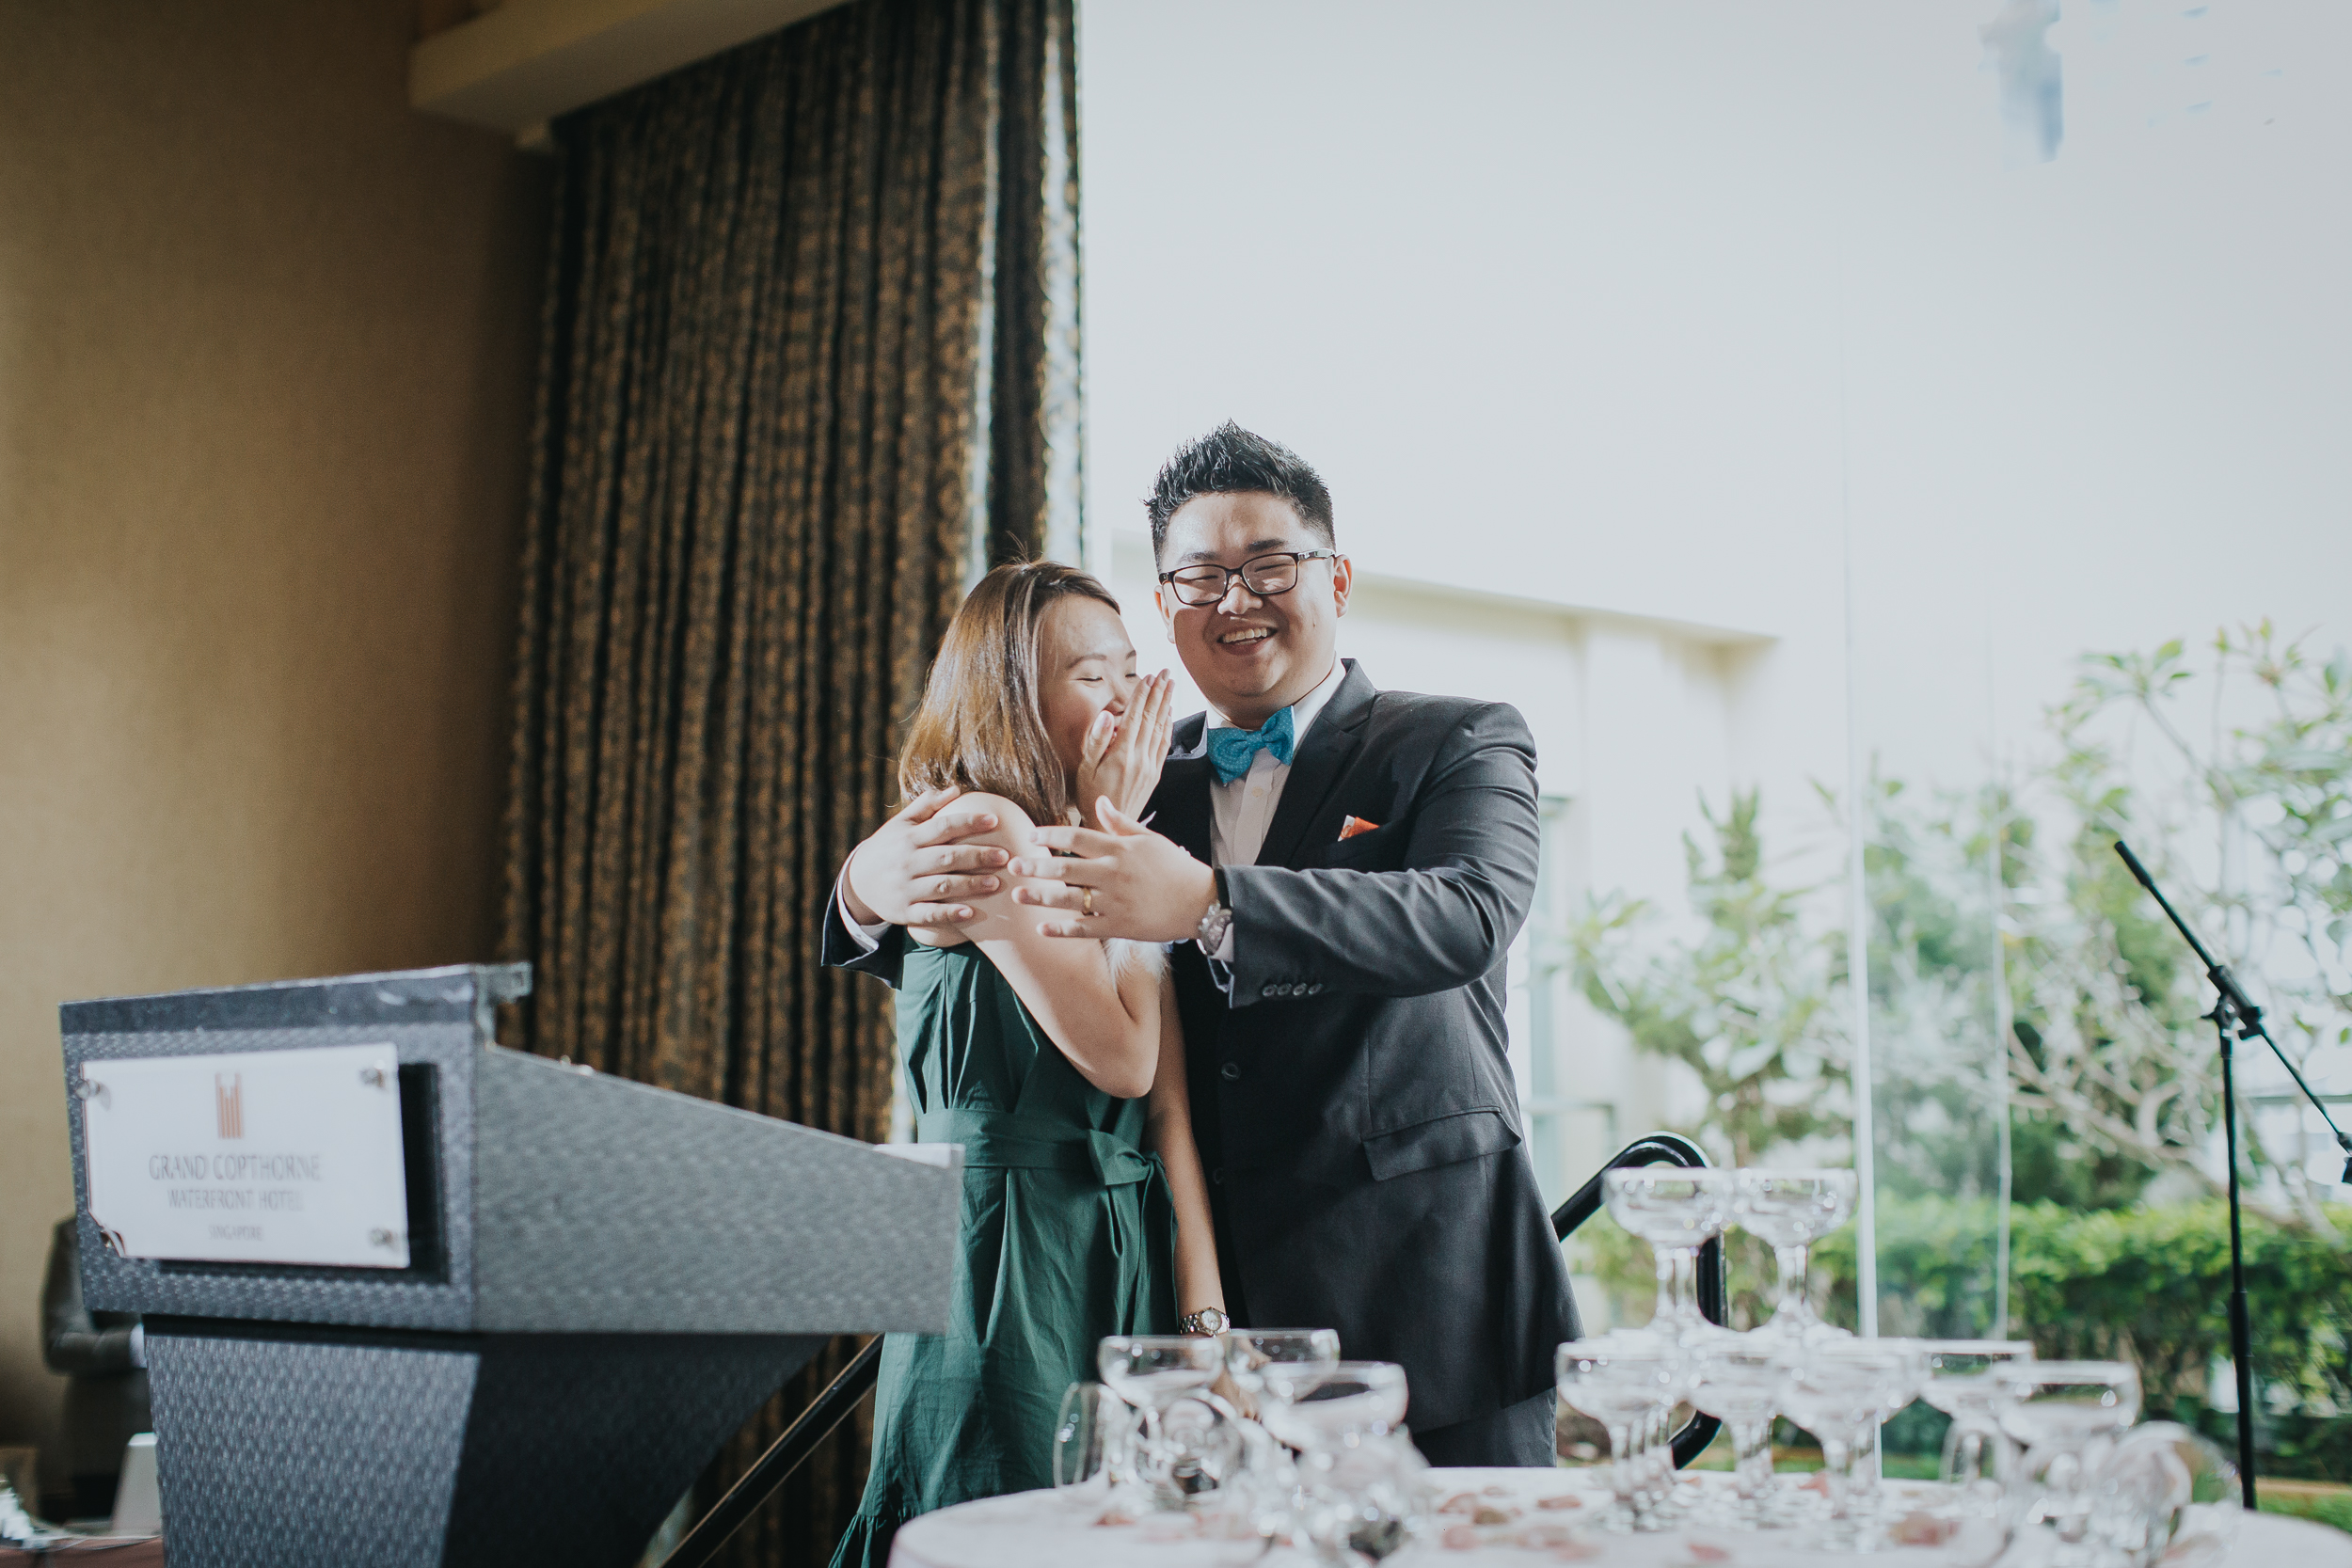 Singapore+Actual+Day+Wedding+Photographer+Grand+Mercure+Oliver+Estelle-0085.jpg